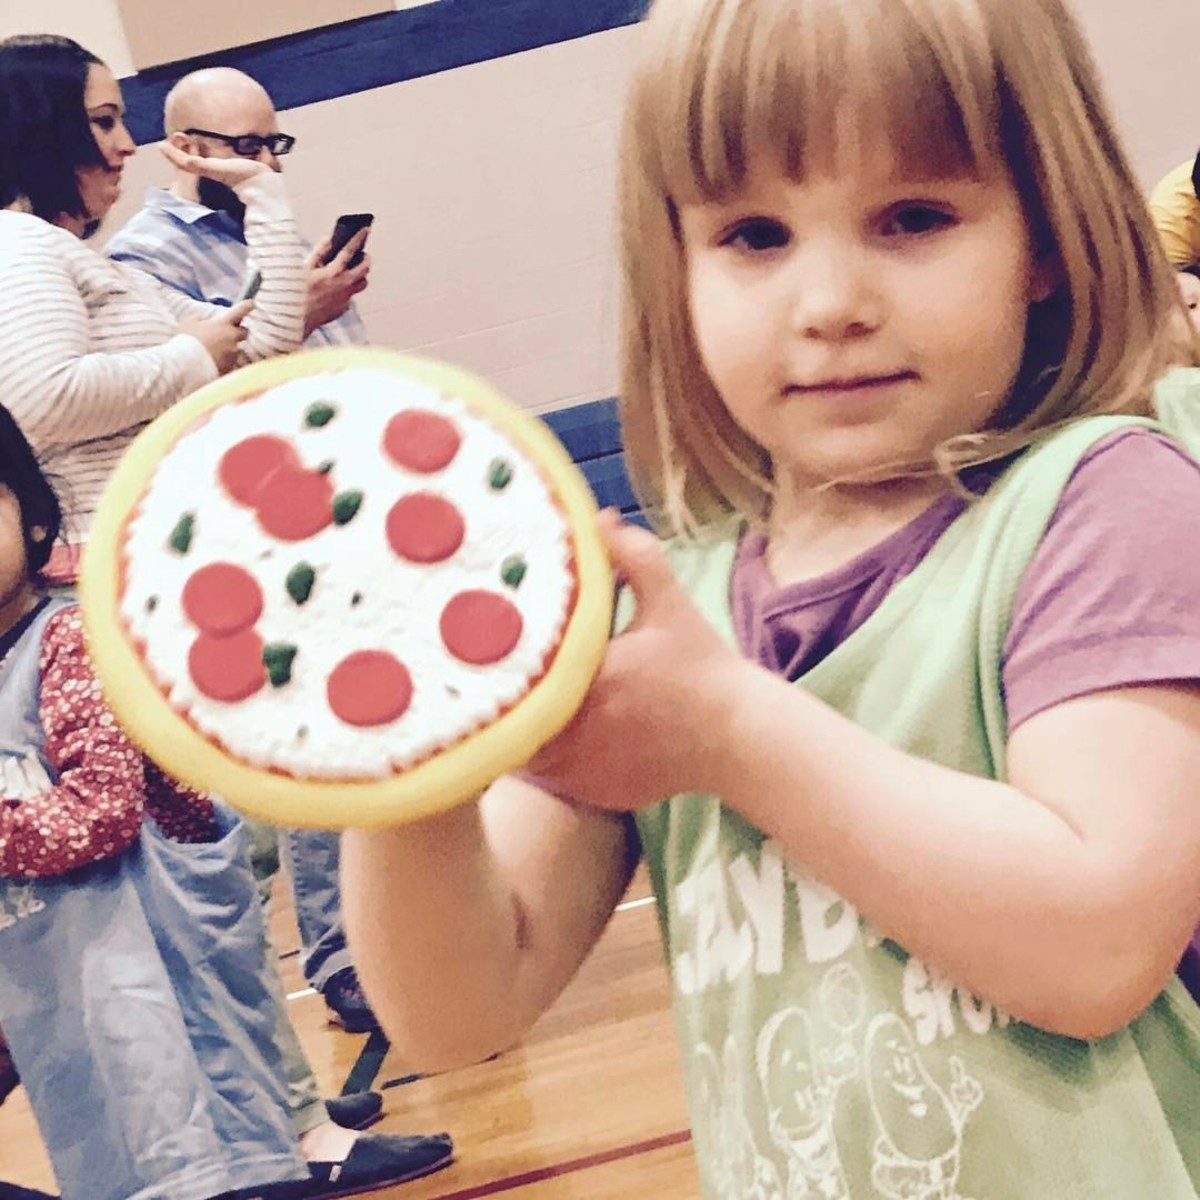 Basketball prep: A girl holds a foam pizza.